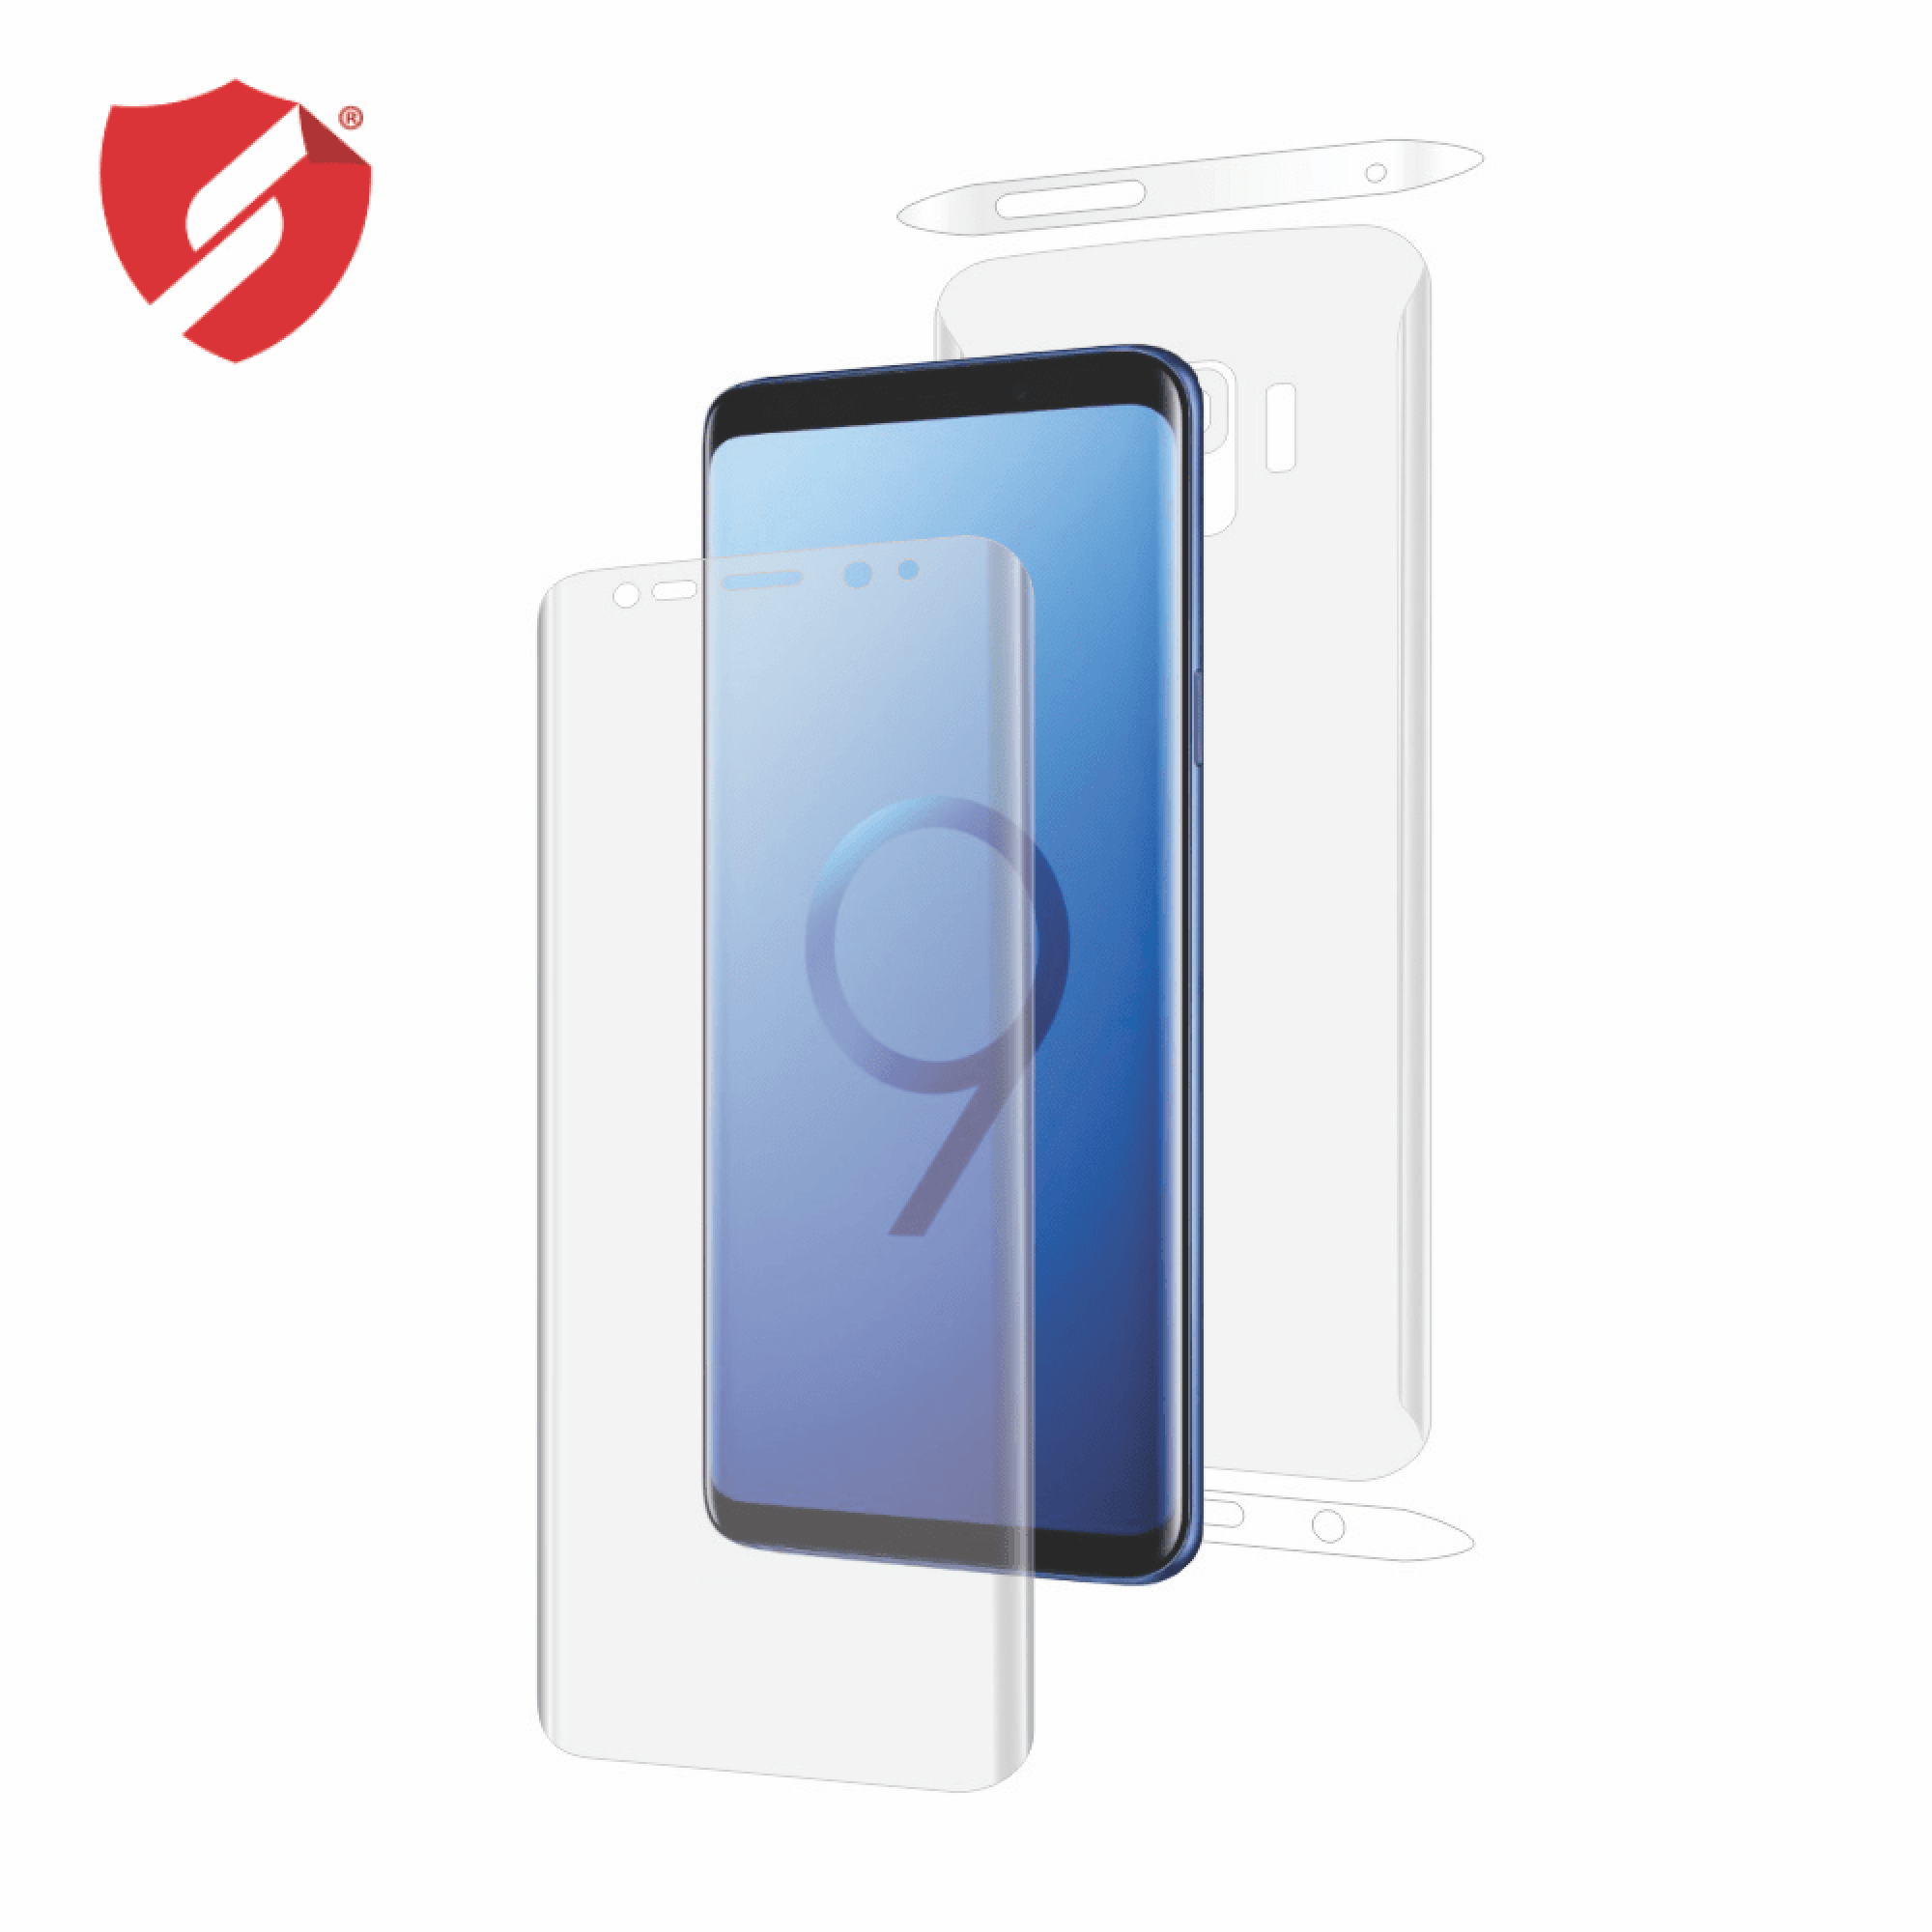 Folie de protectie Smart Protection Samsung Galaxy S9 compatibila cu carcasa Spigen Rugged Armor - fullbody - display + spate + laterale imagine